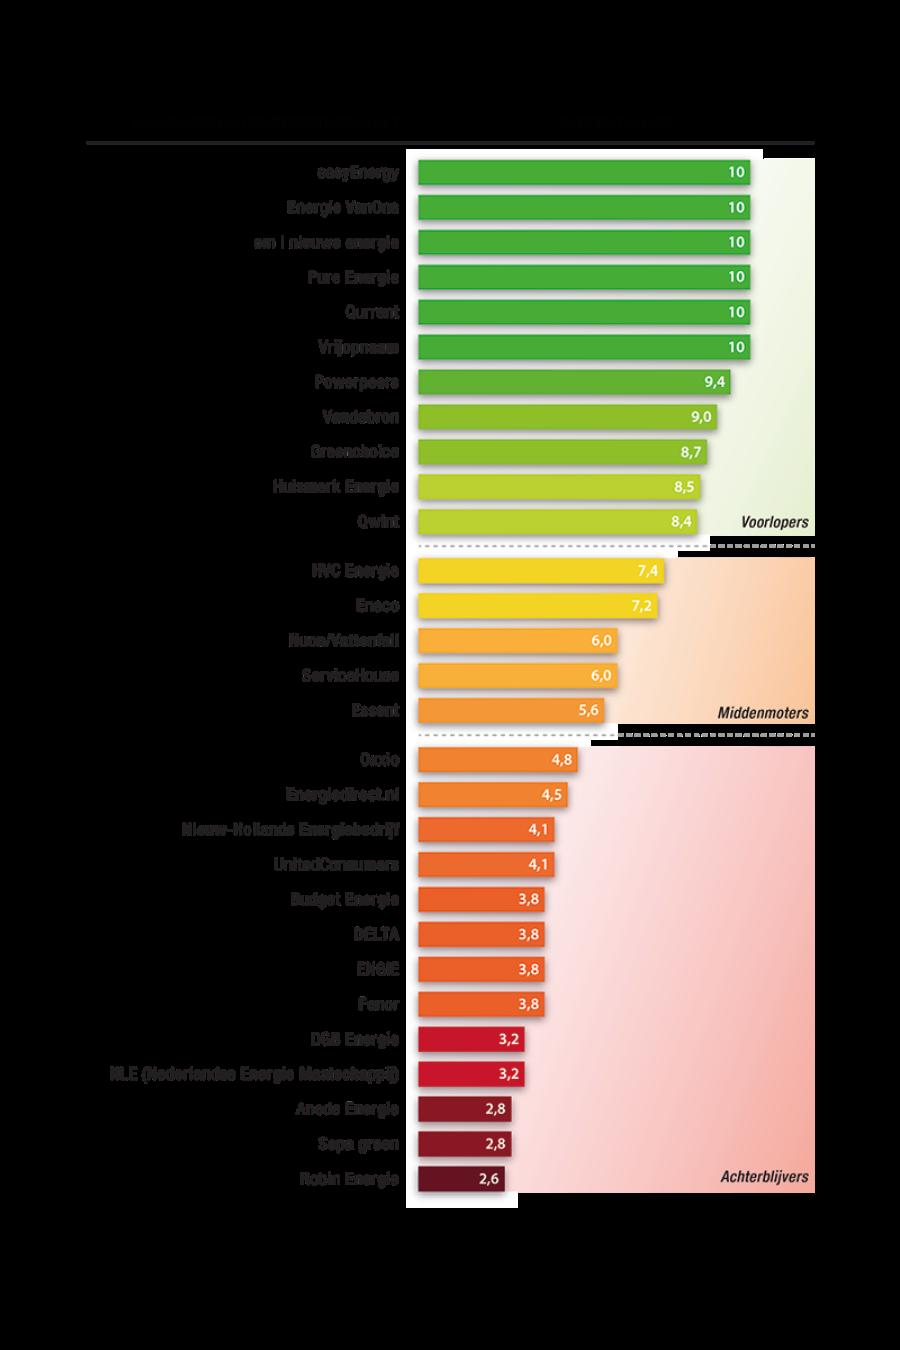 Groene energie | Groenste energieleveranciers van Nederland | Consumentenbond en Greenpeace | Tidy Minds